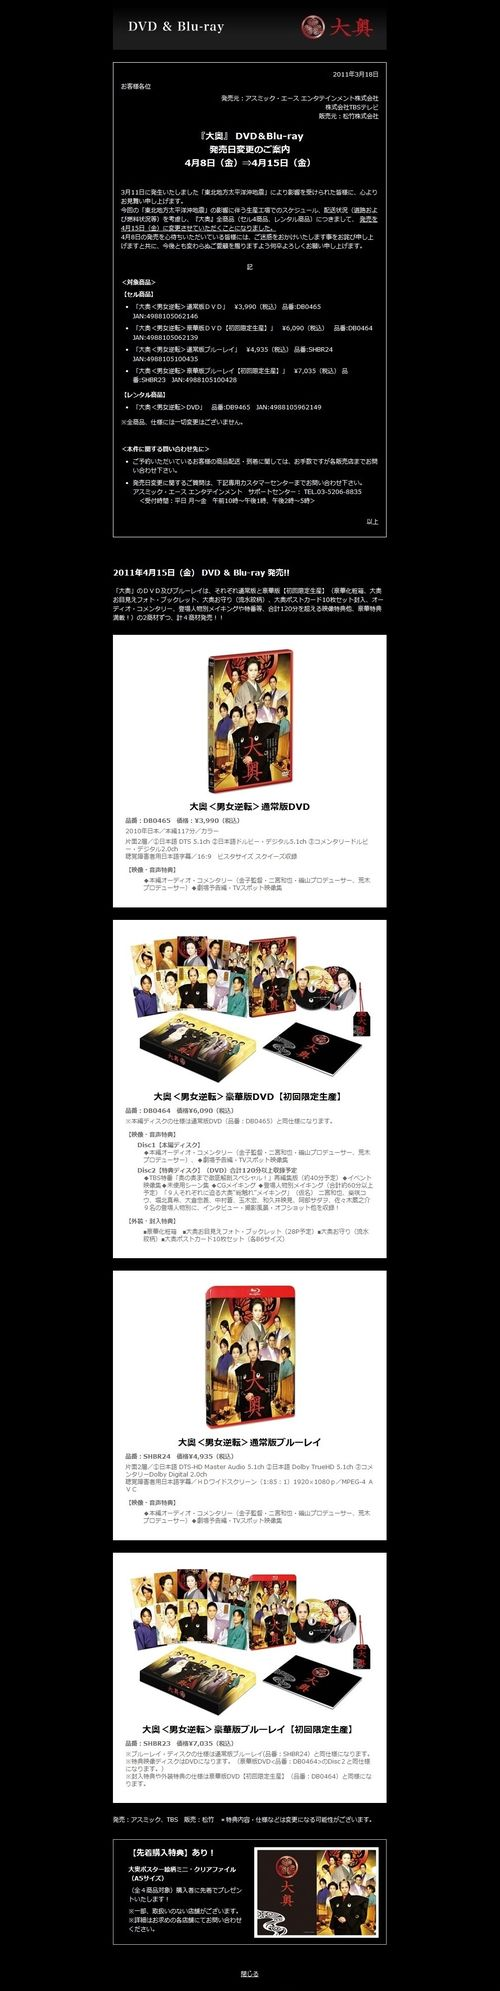 Sortie dvd ohoku 15.04.2010